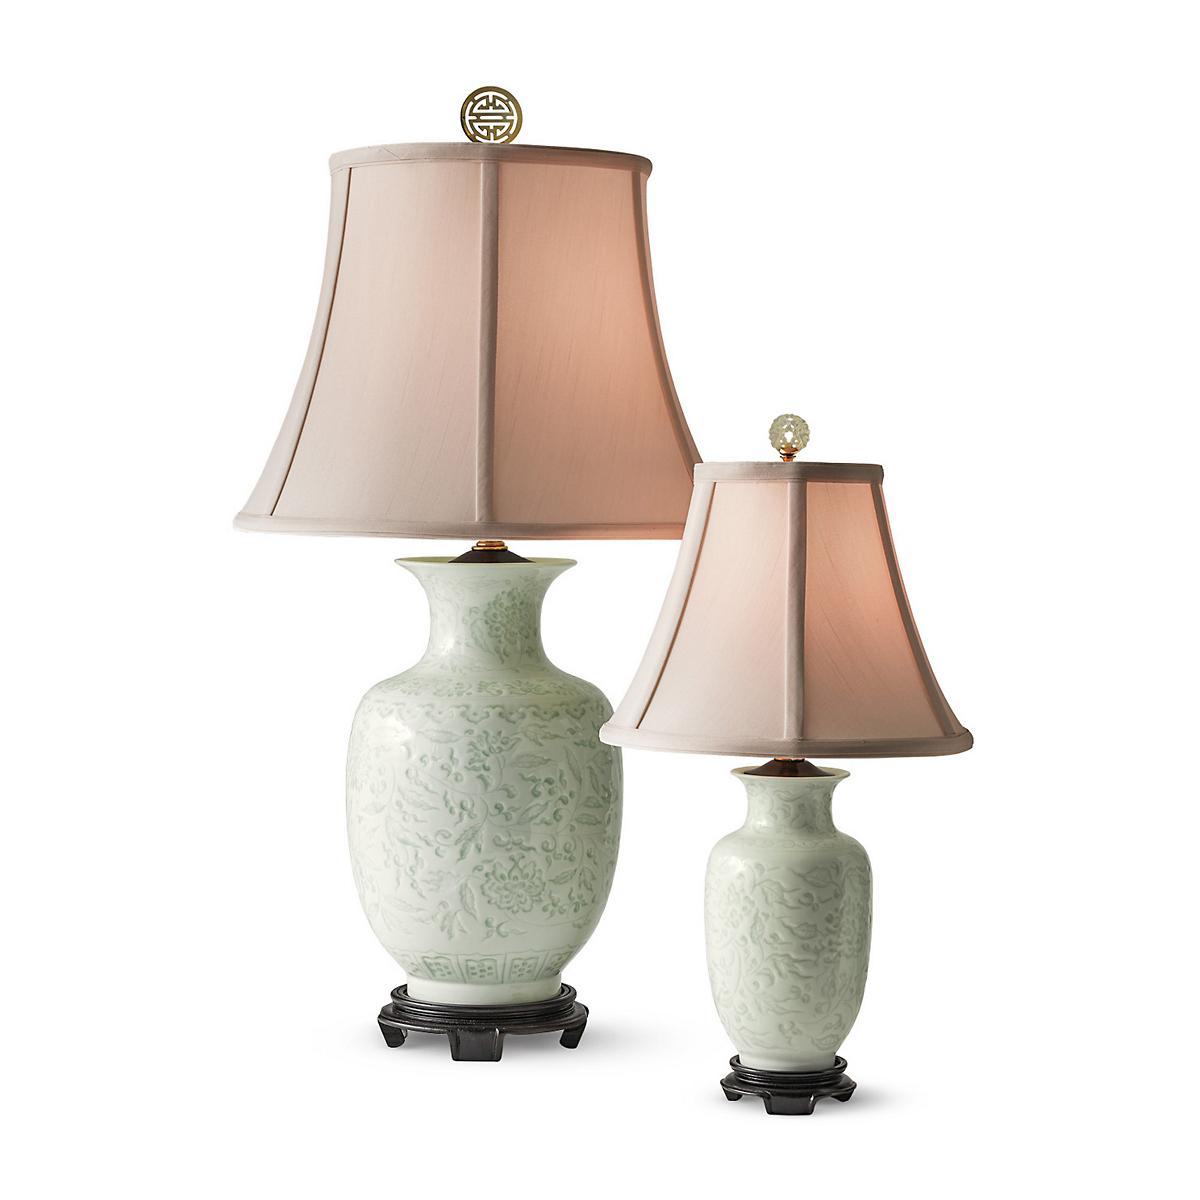 Celadon dynasty lamps